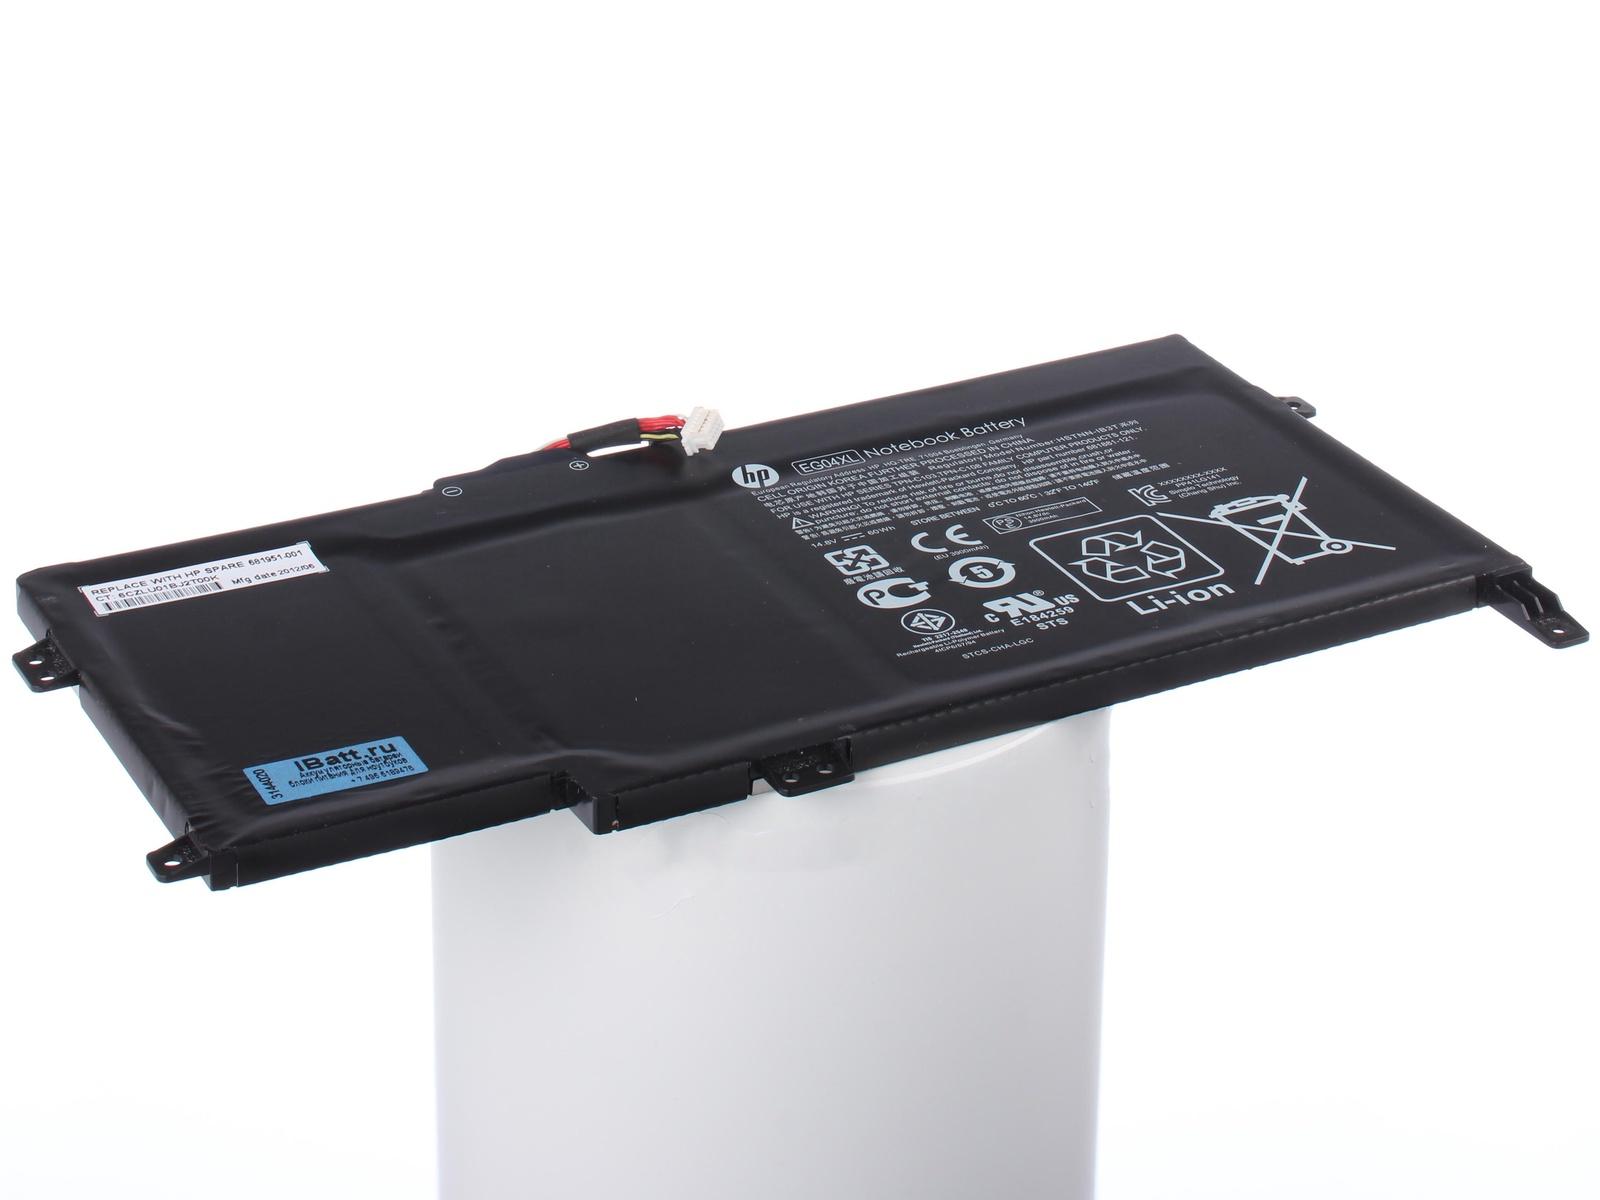 Аккумулятор для ноутбука iBatt для HP-Compaq Envy 6-1031er, Envy 6-1150er, Envy 6-1254er, Envy 6-1101er, Envy 6-1154er, ENVY Sleekbook 6-1031er, Envy 6-1251er, Envy 6-1053er, Envy 6-1000, Envy 6-1252er, Envy 6-1253er